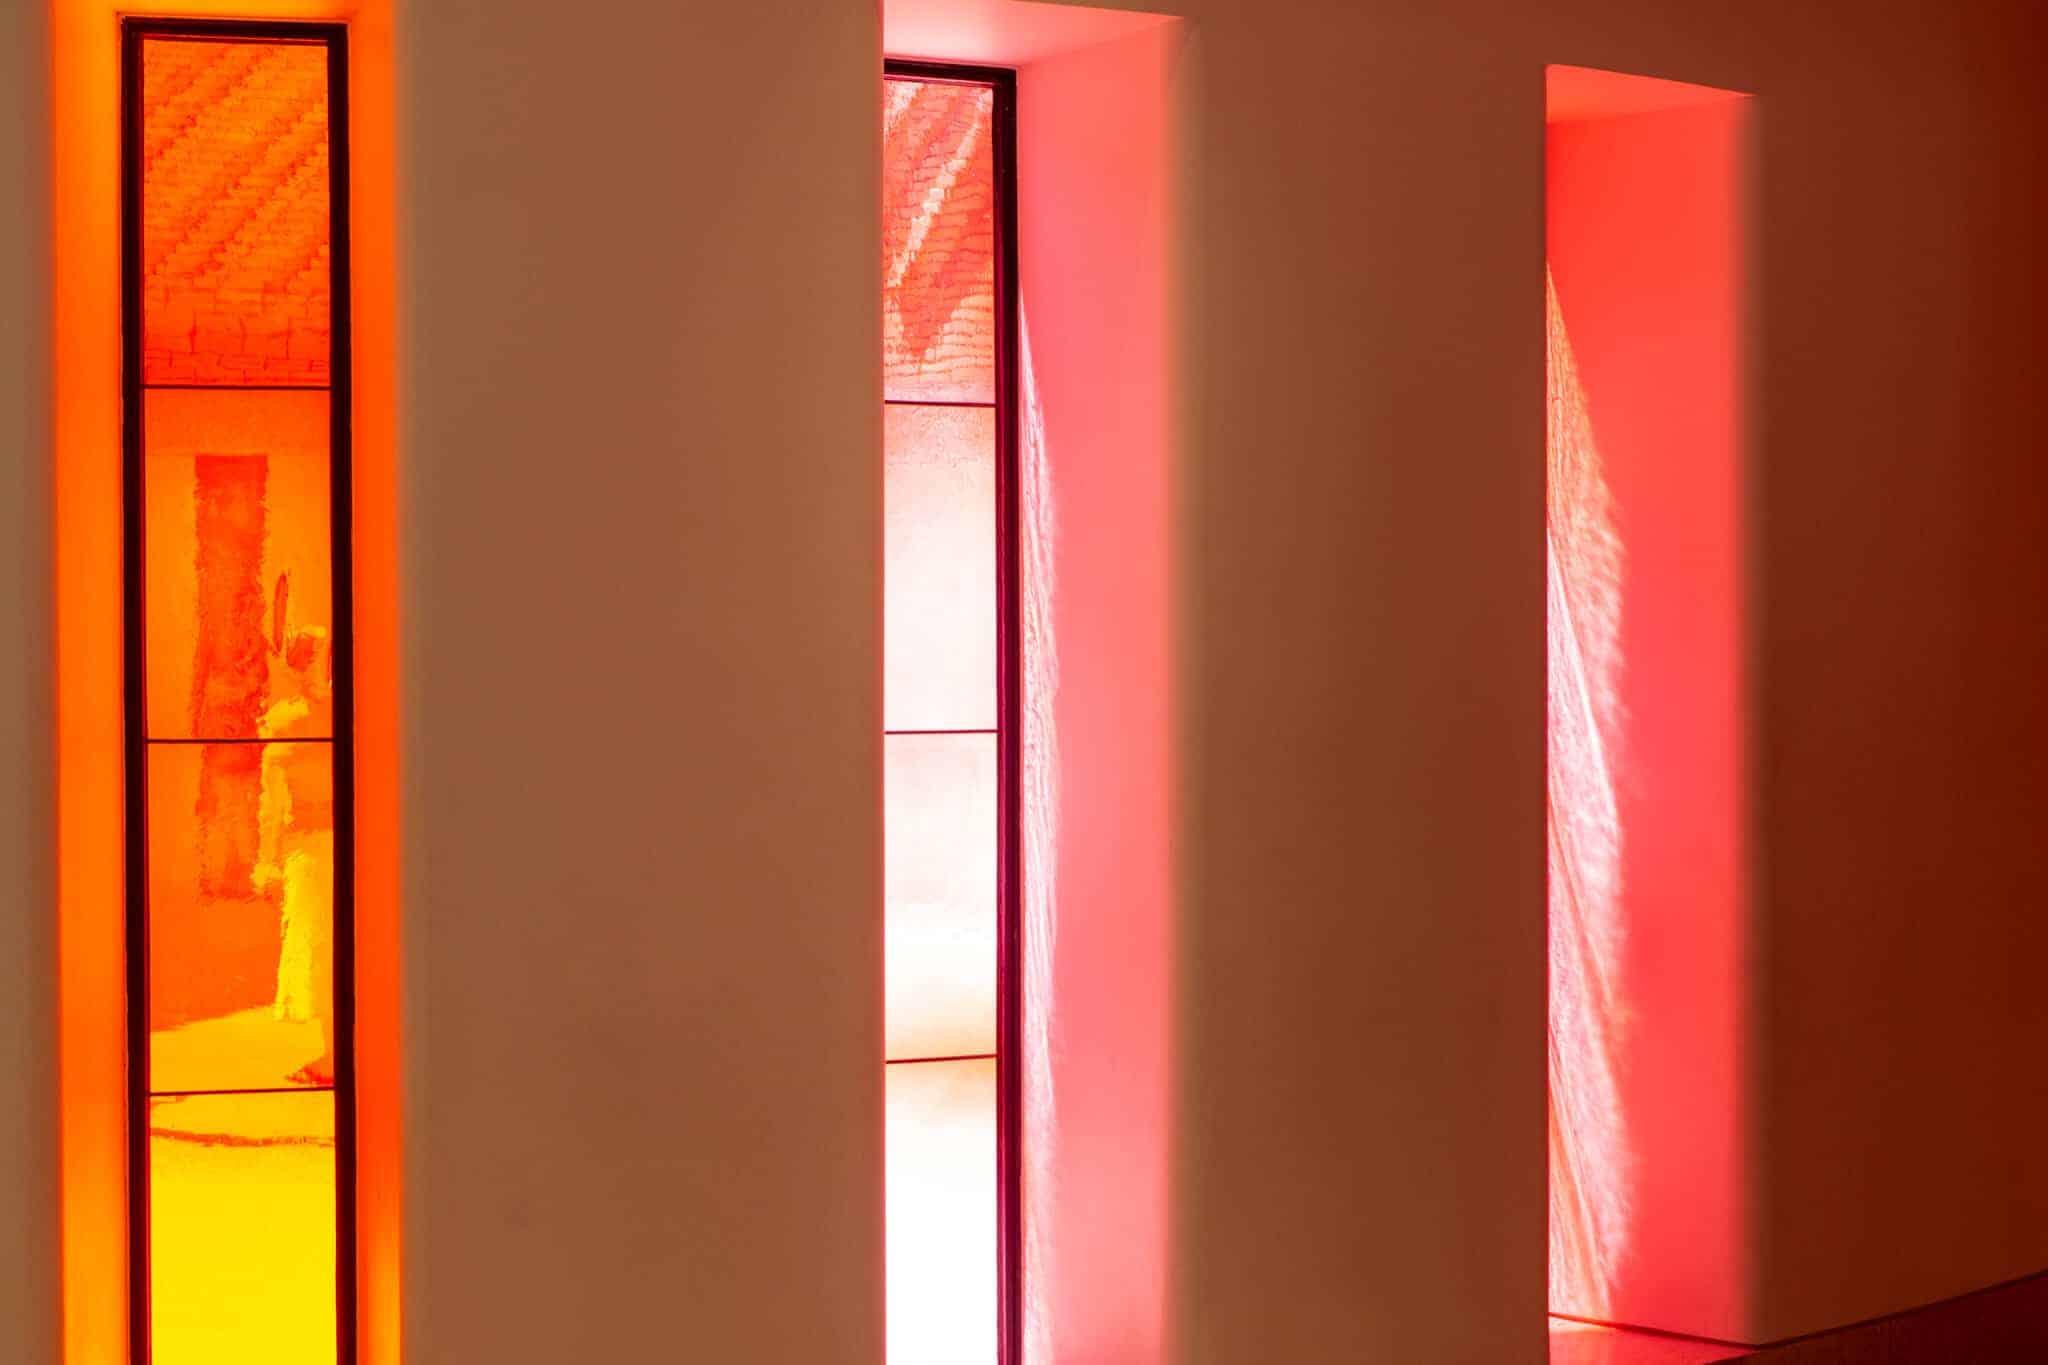 ysl museum windows